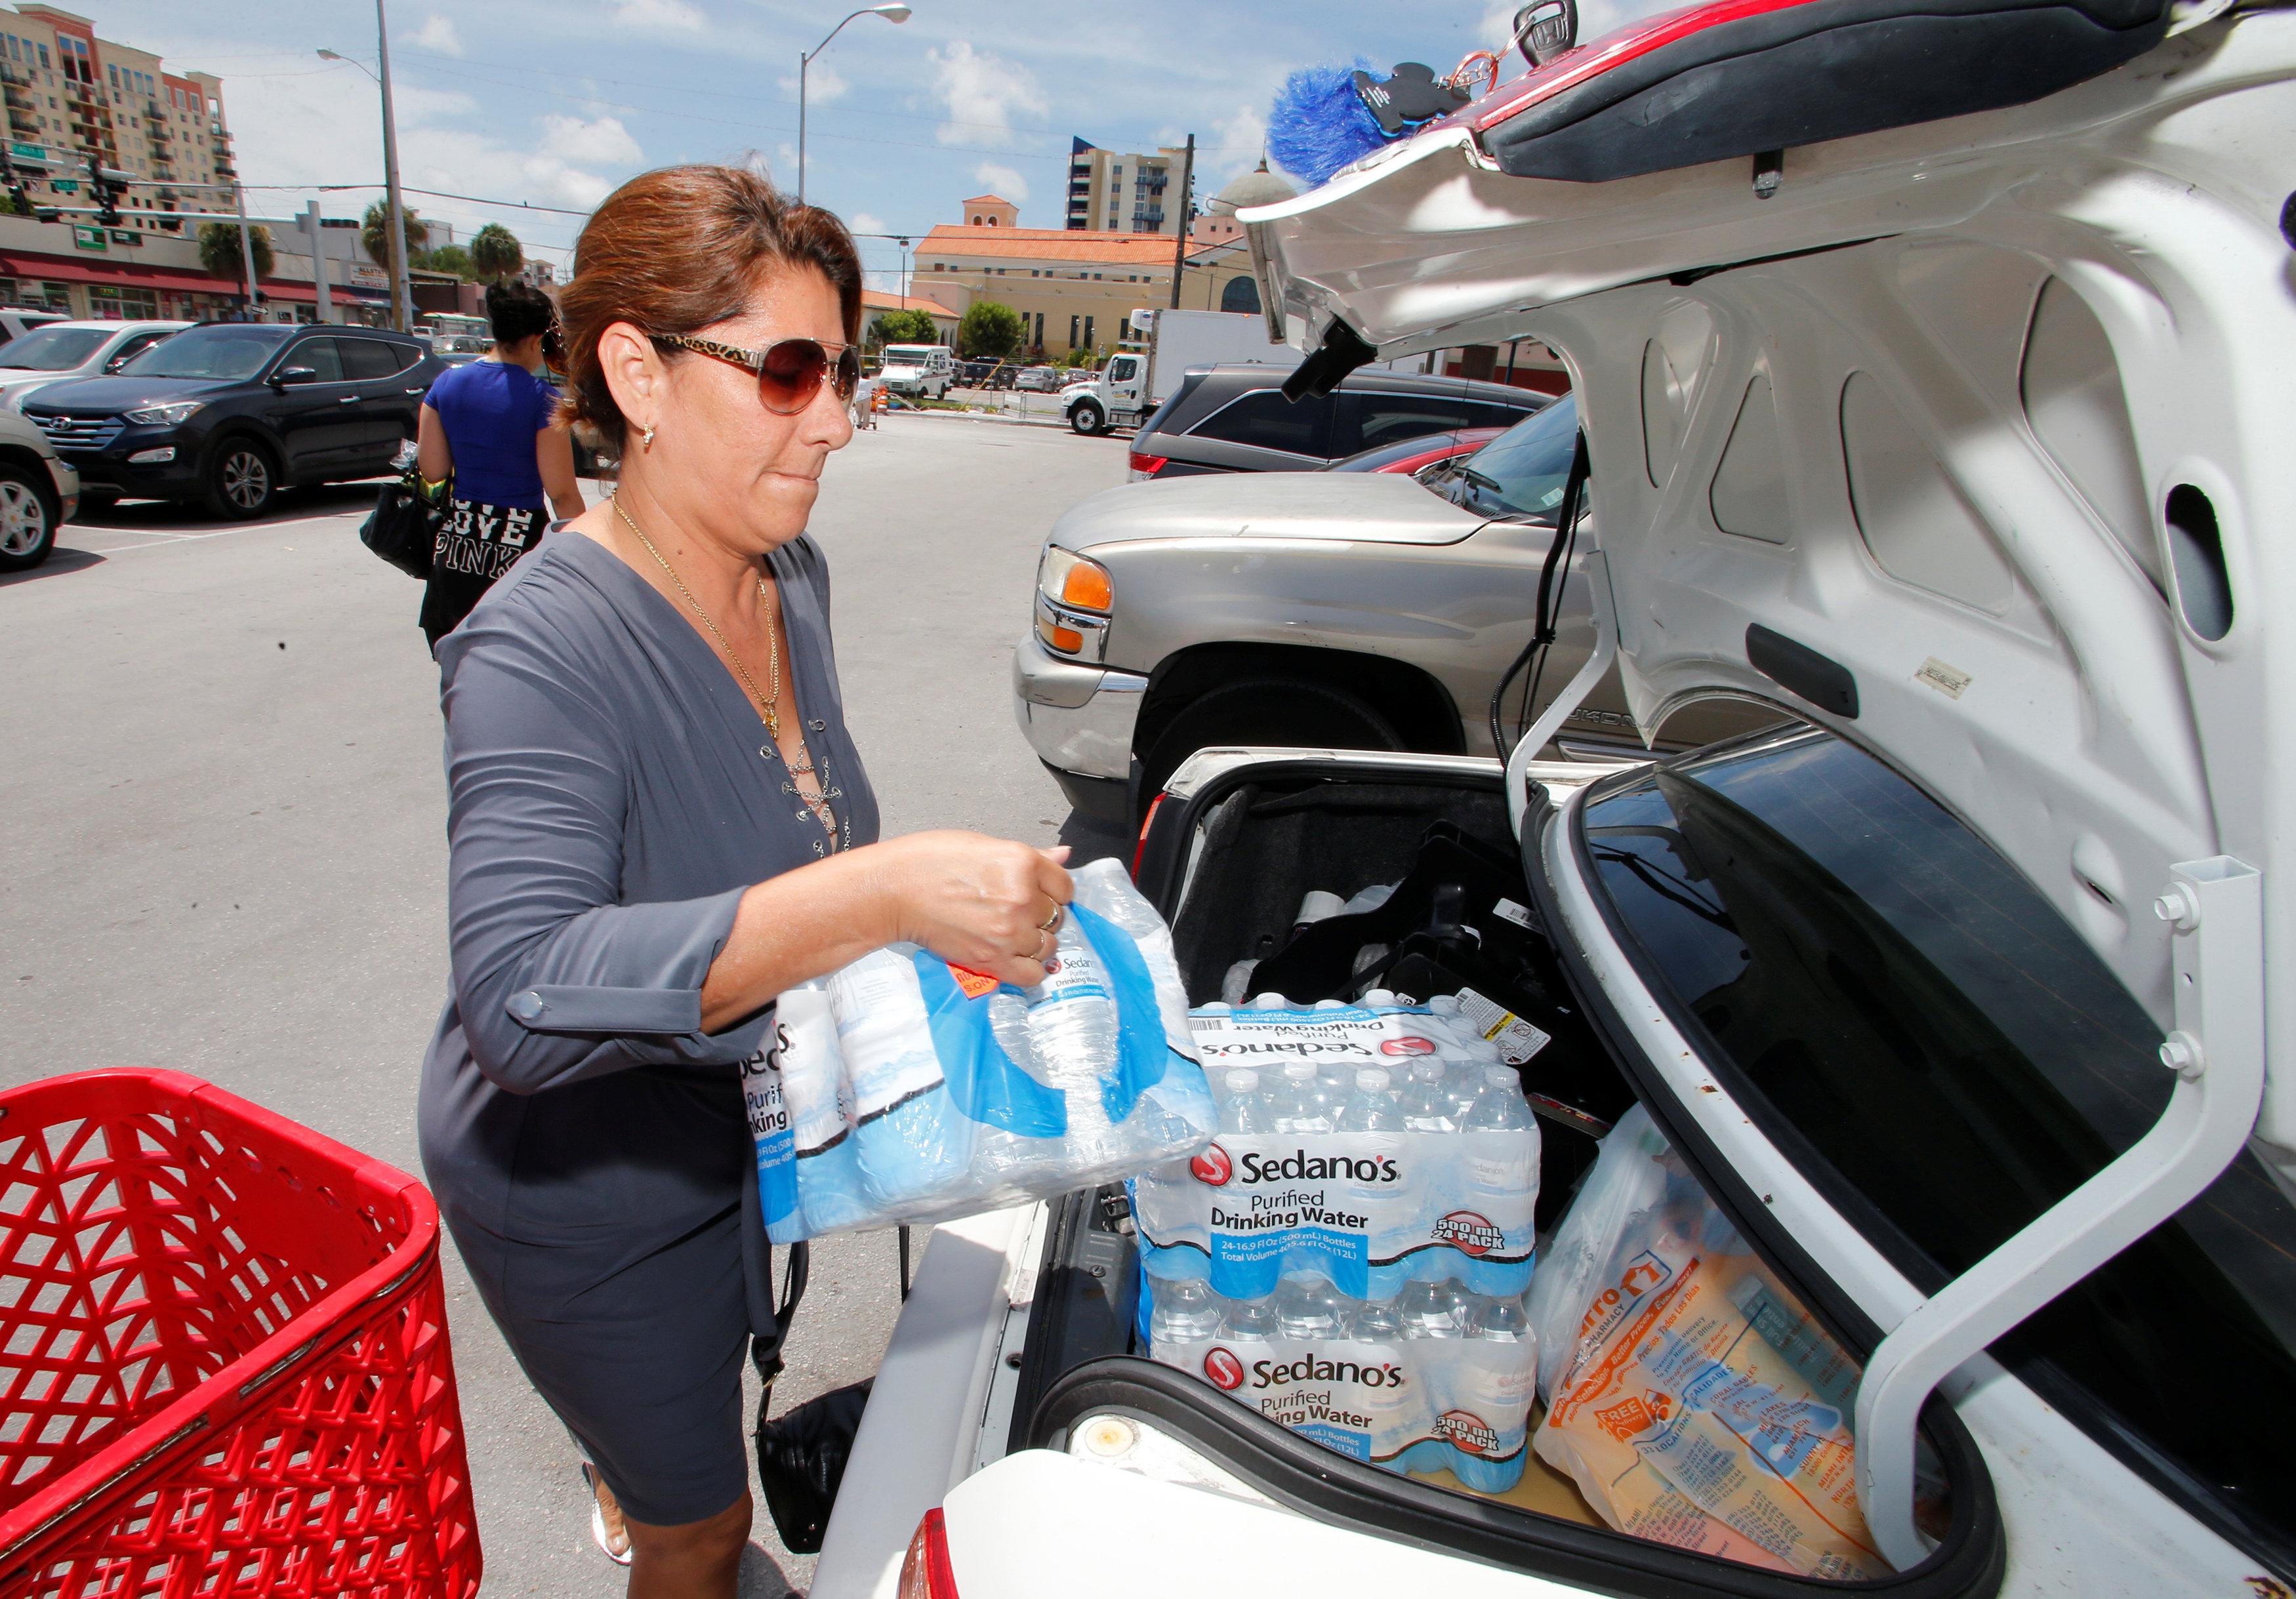 Ligia Marquez loads water she purchased in Sedano's Supermarket in the Little Havana neighborhood in Miami, Florida on Sept. 5, 2017. (REUTERS/Joe Skipper)